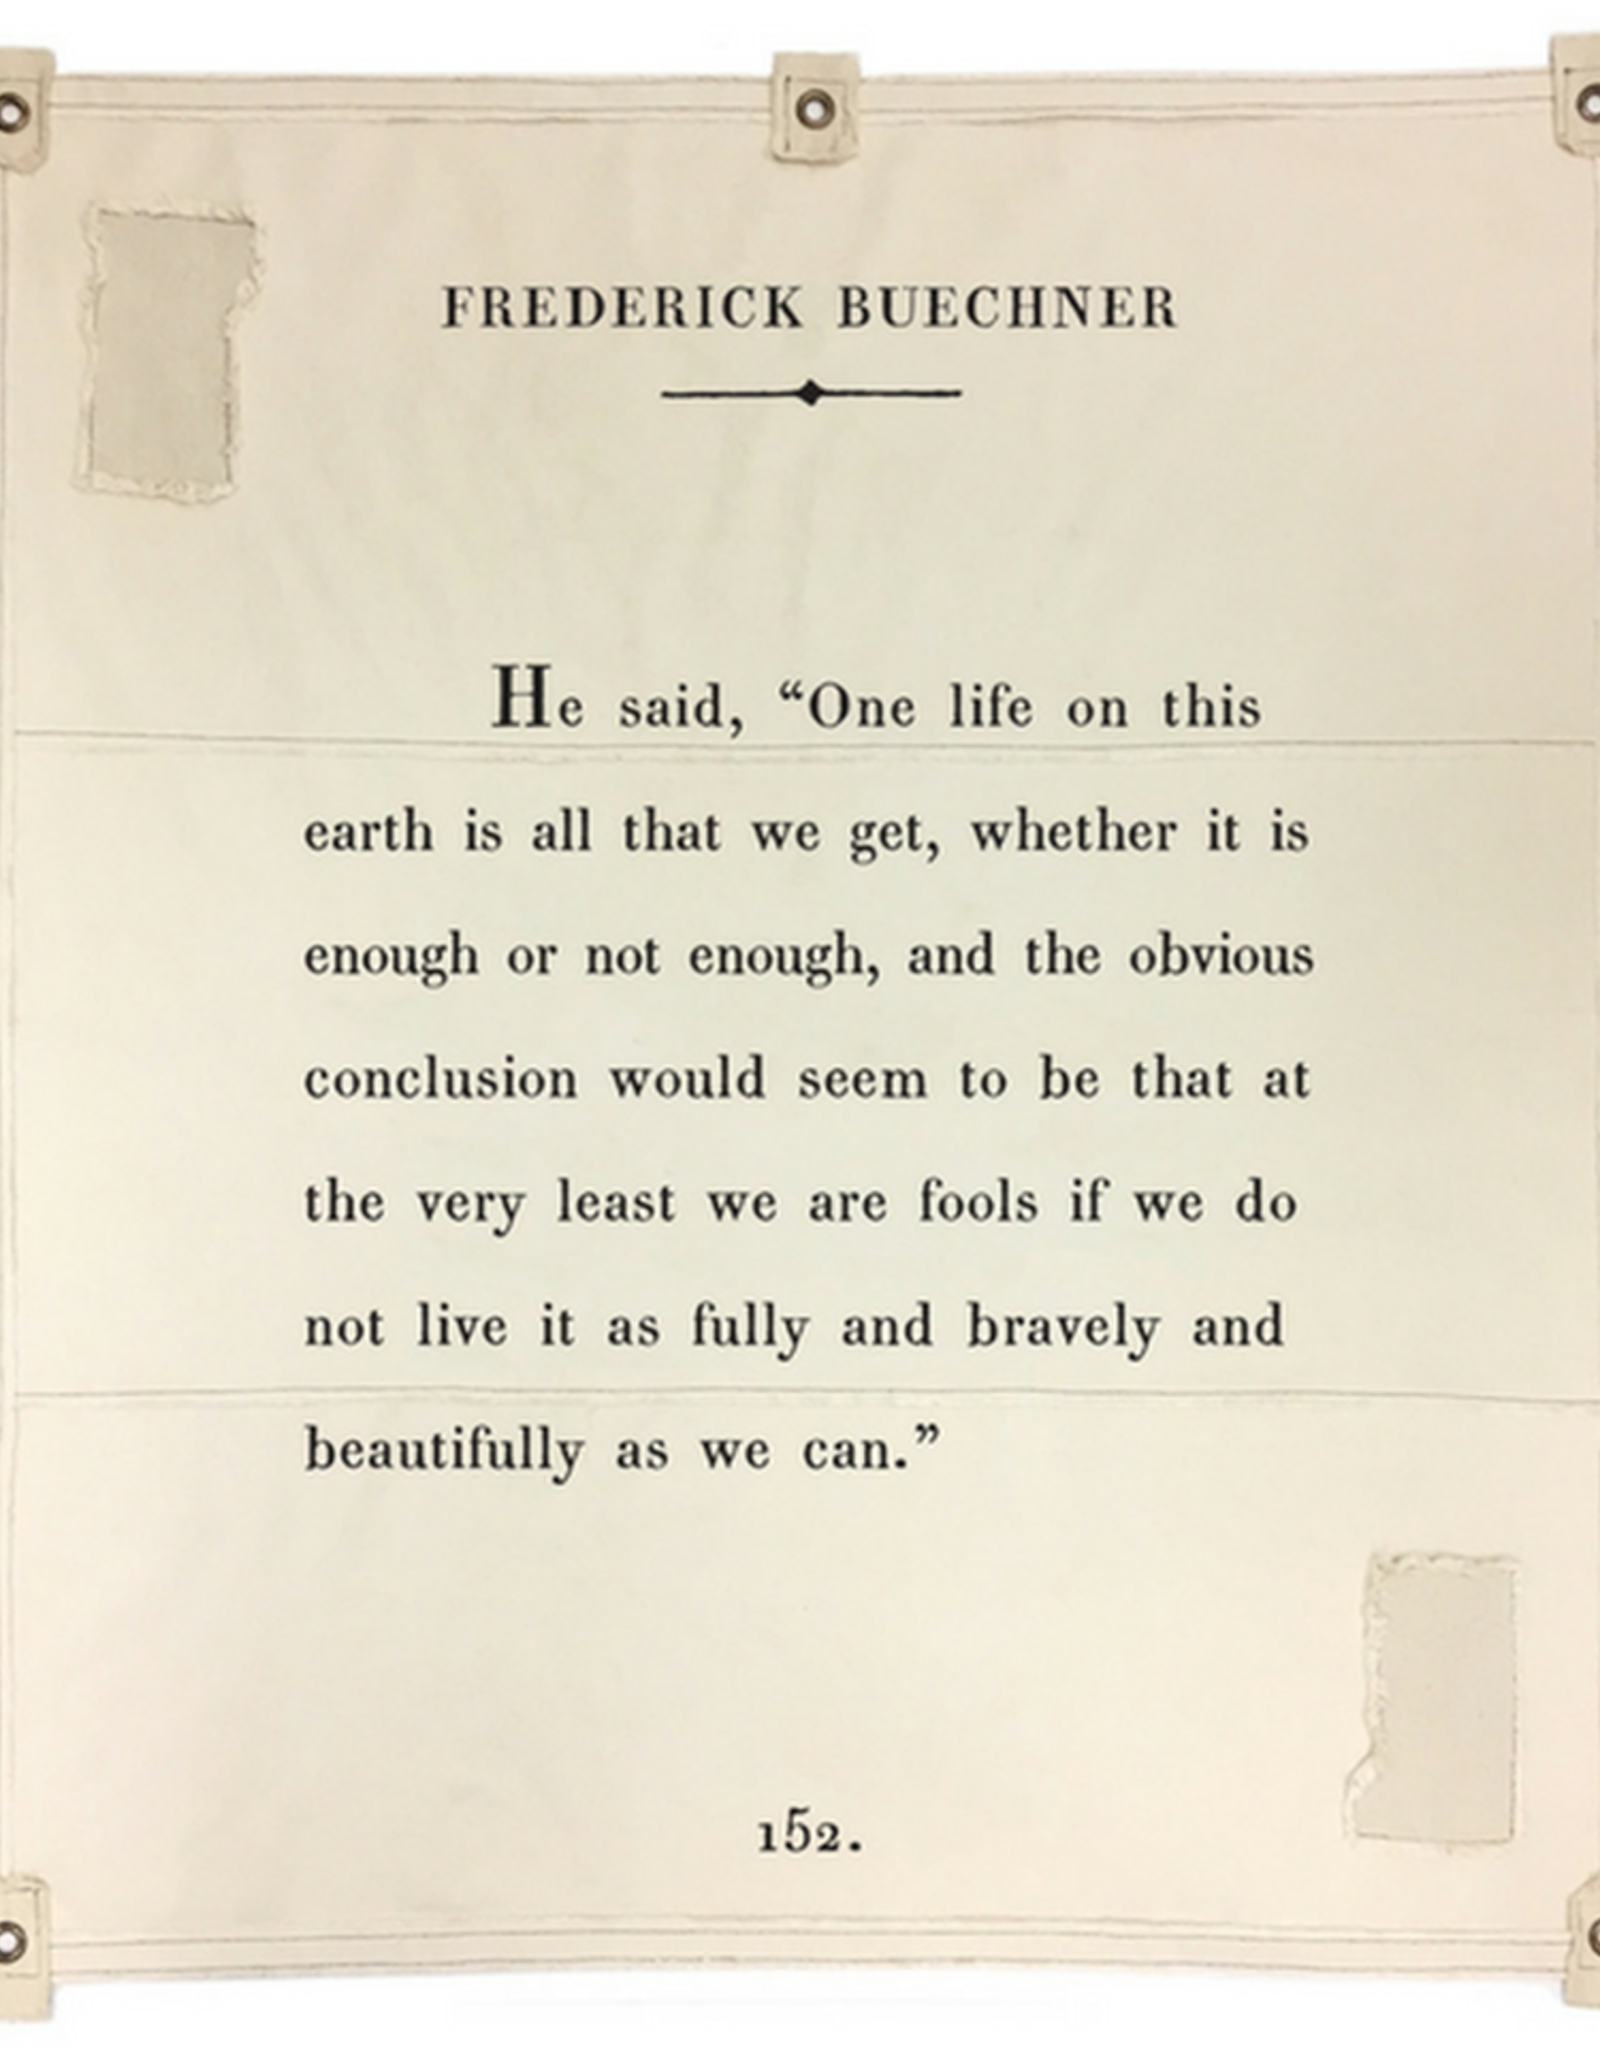 SB-Co Frederick Buechner Tarp